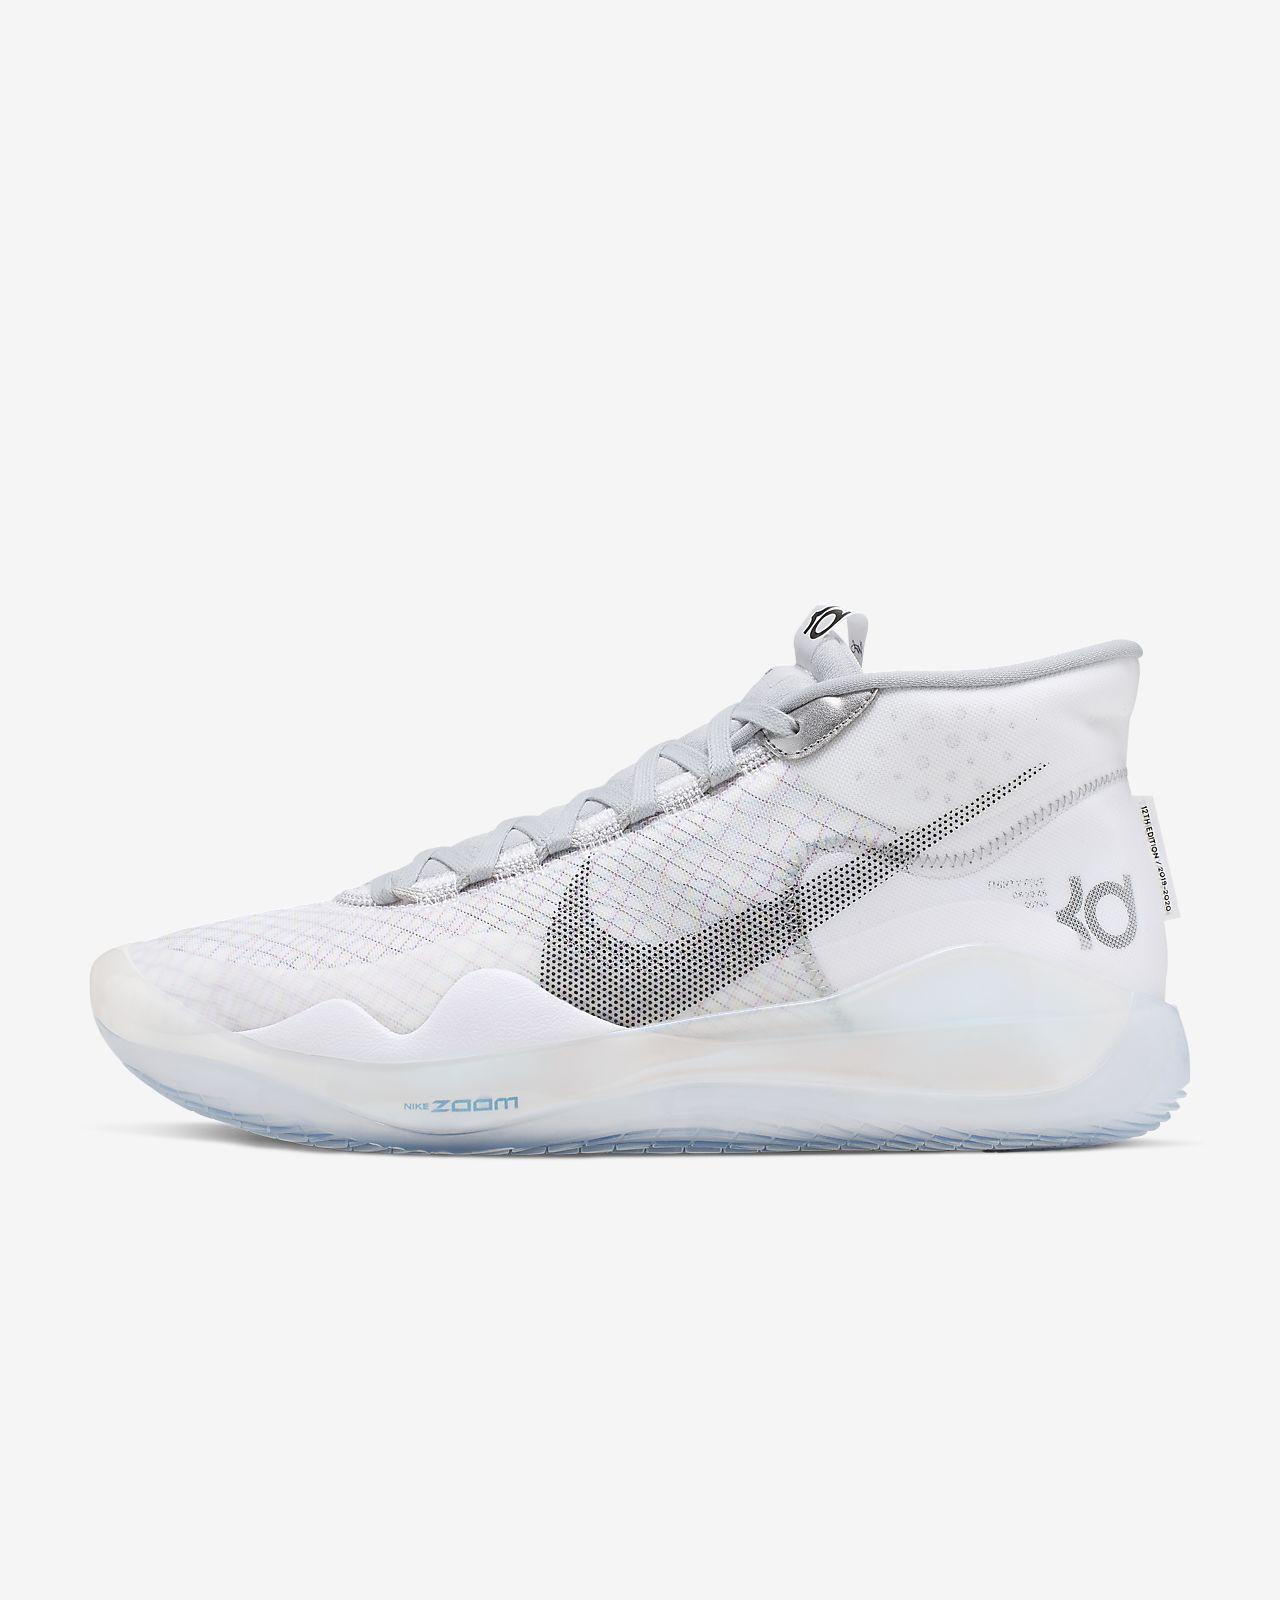 Chaussure Basketball Kd12 Nike Zoom De WI2YD9EH